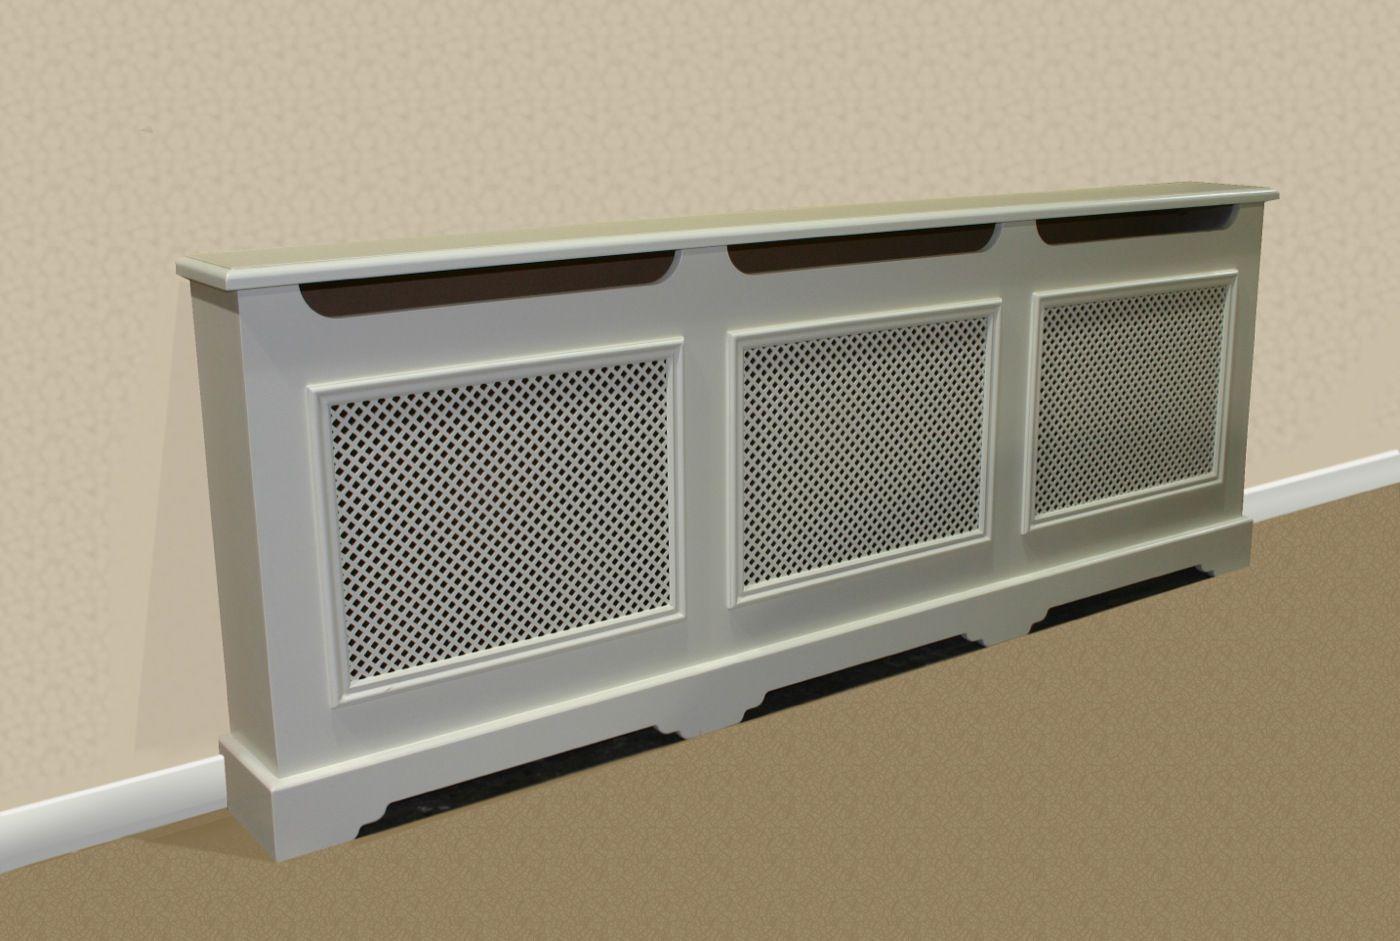 radiator cover ideas interior design ideas tips inspiration rh pinterest com